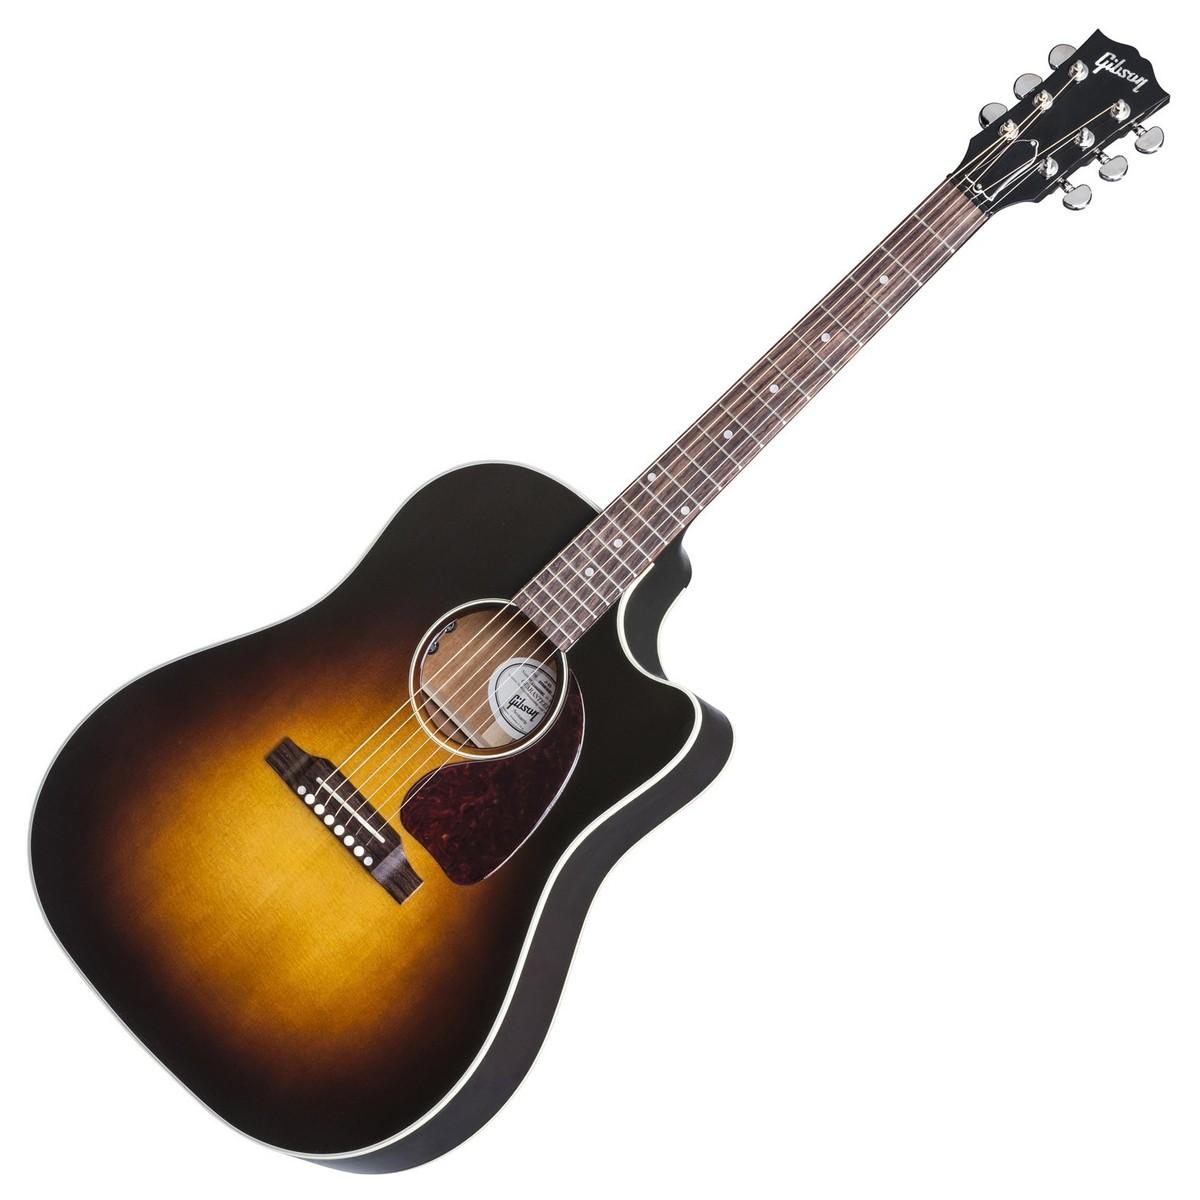 gibson j 45 cutaway electro acoustic guitar vintage. Black Bedroom Furniture Sets. Home Design Ideas